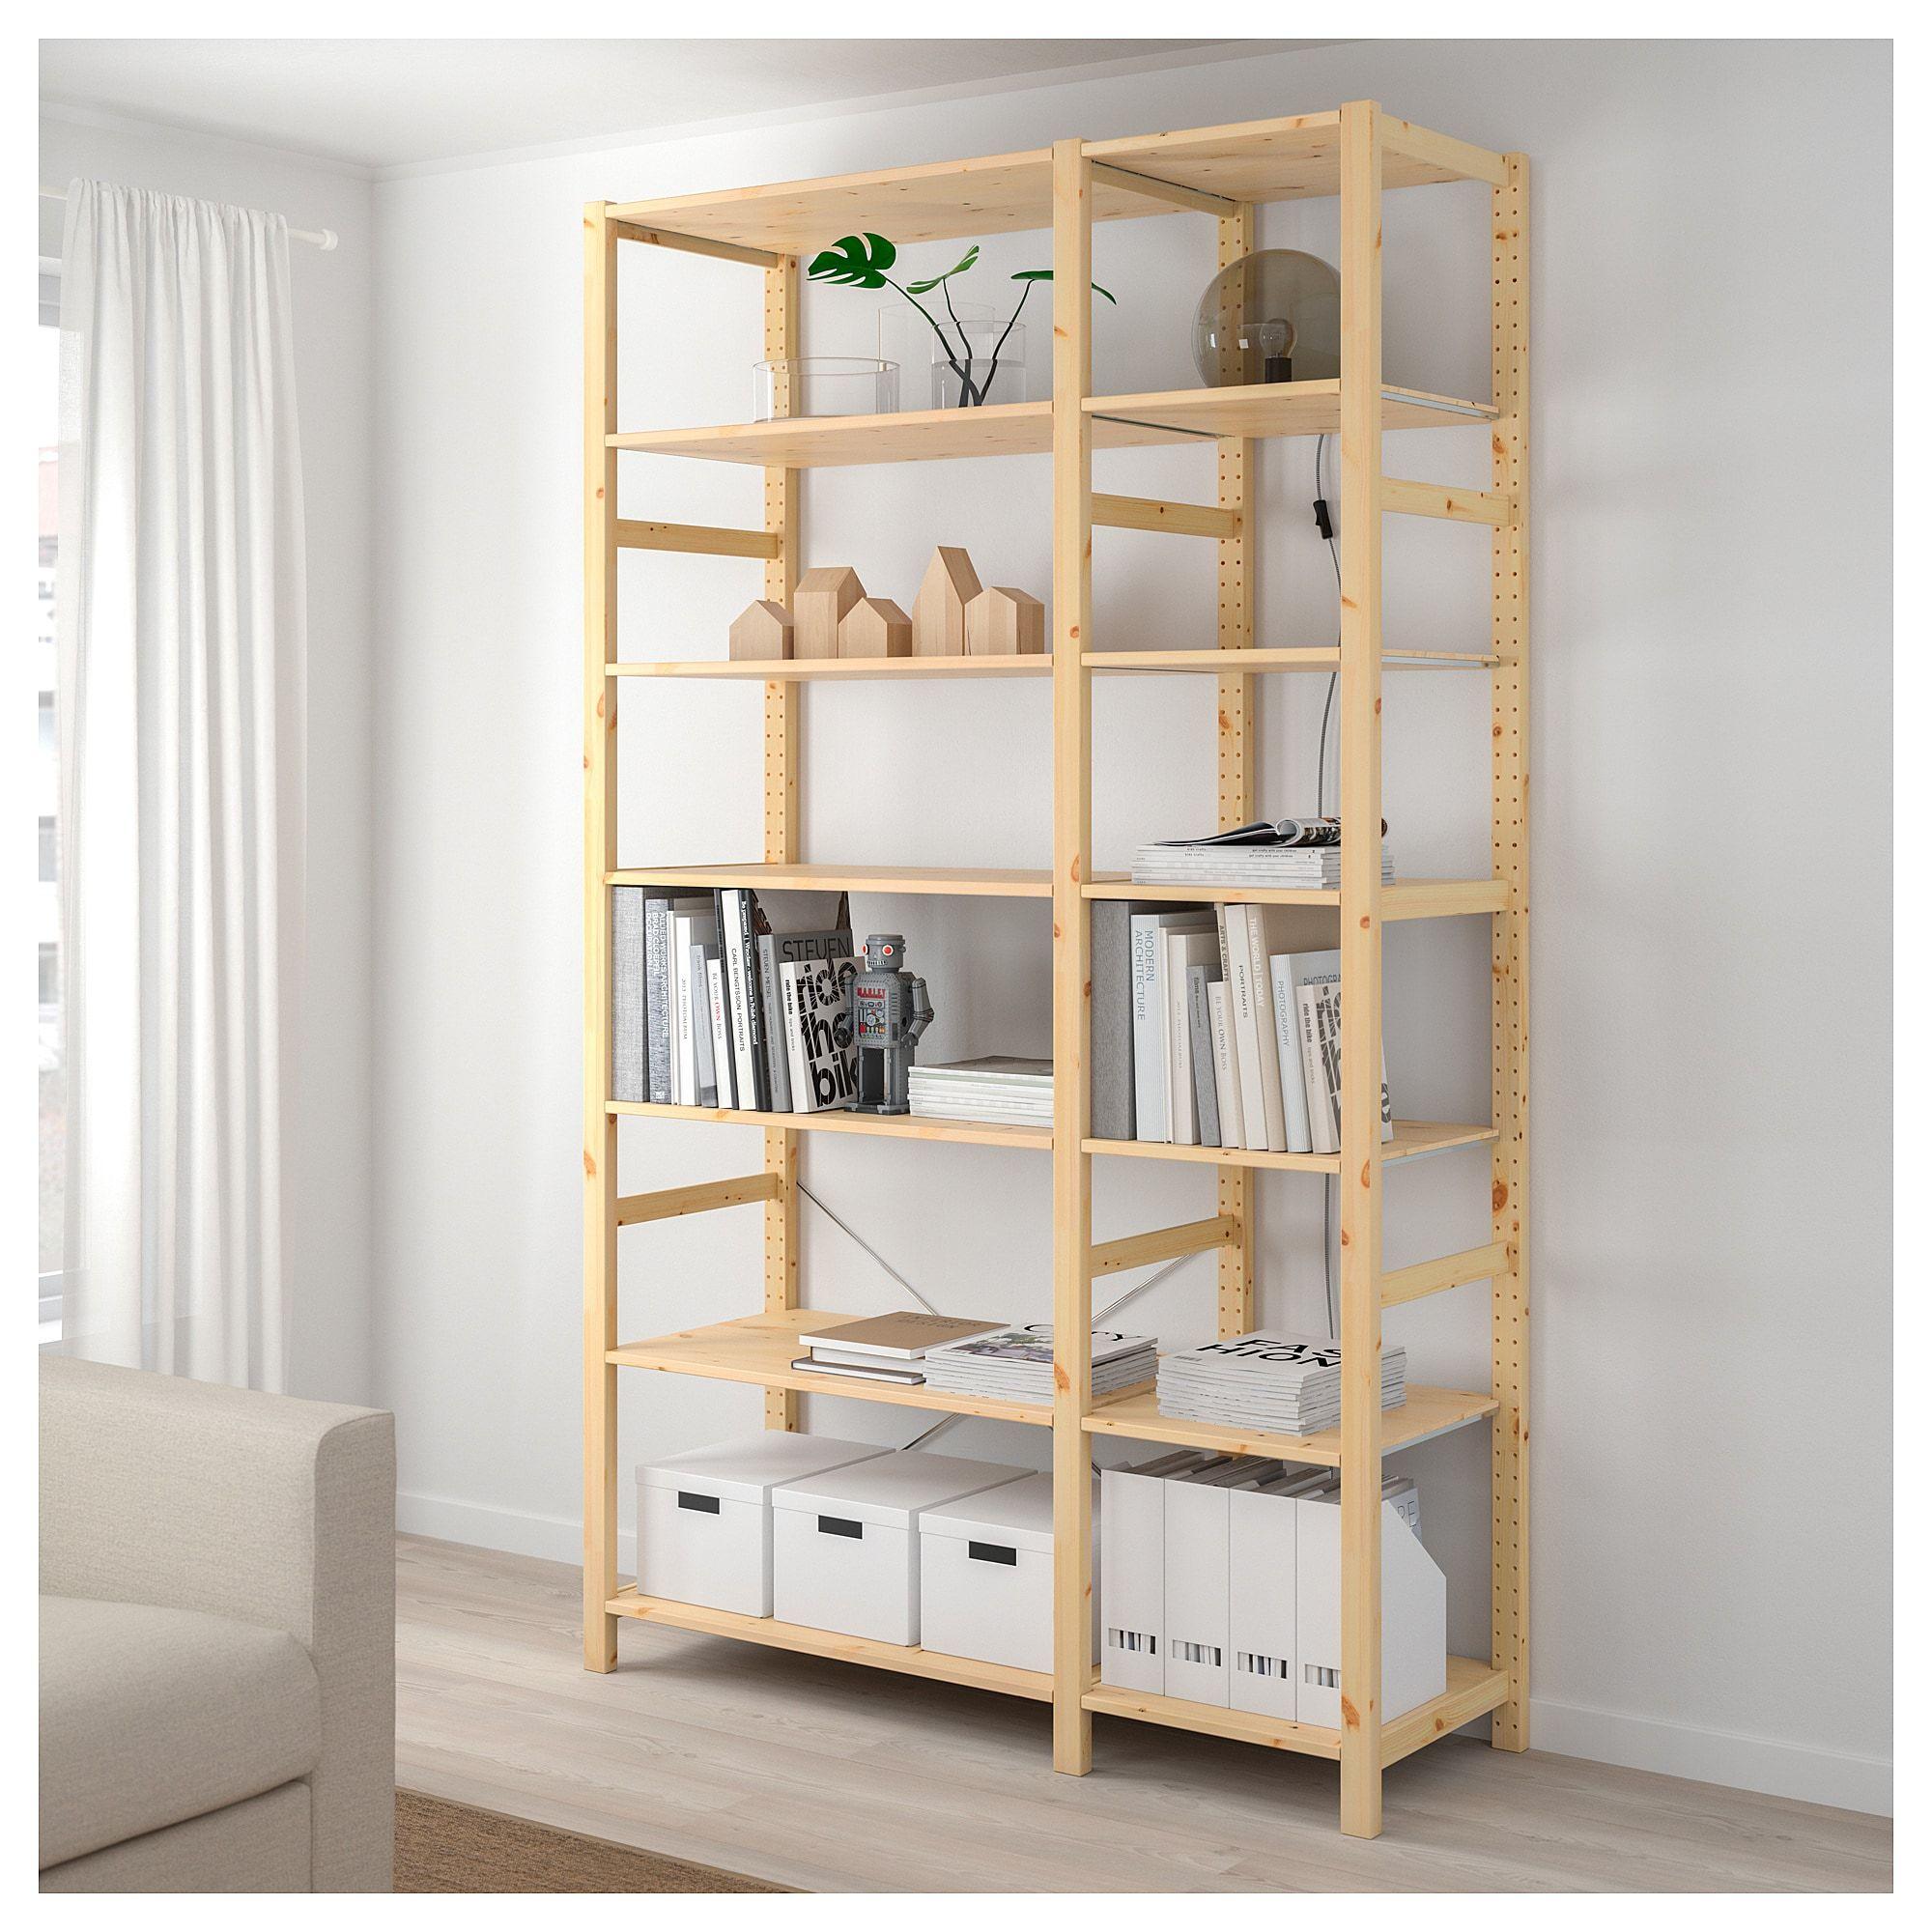 HEJNE 4 ElemRegale Kiefer IKEA Österreich